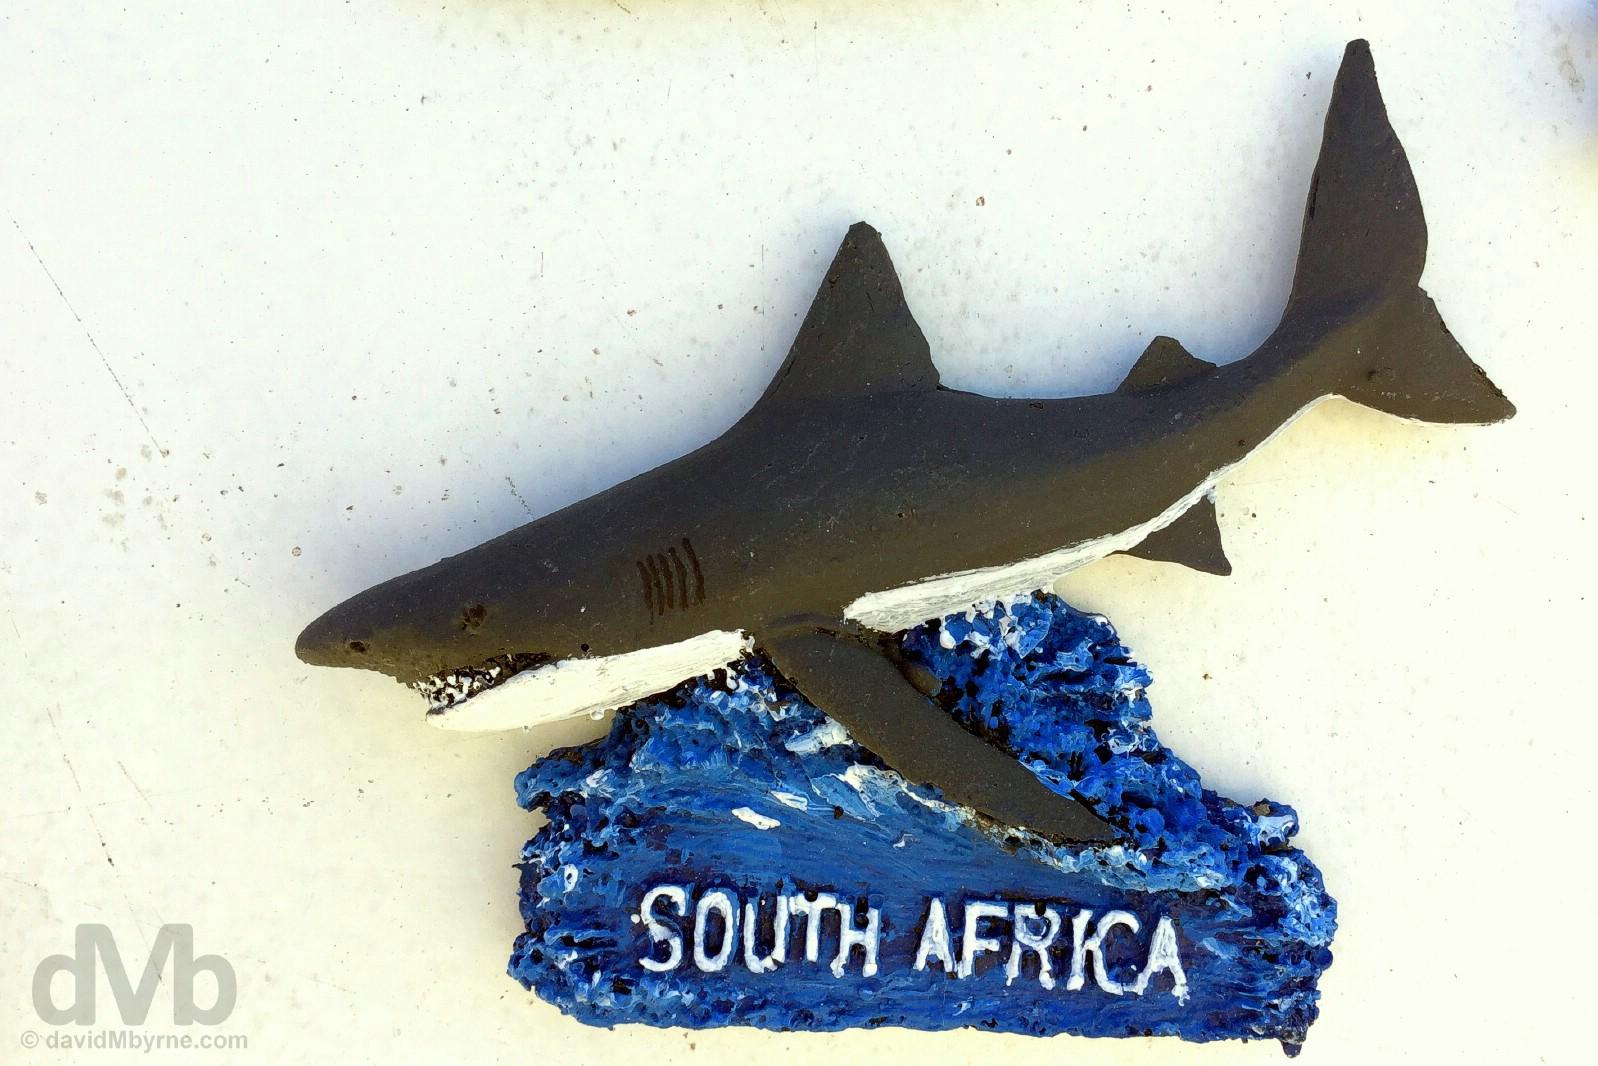 A handmade fridge magnet for sale in Kleinbaai, Overberg, Western Cape, South Africa. Febraury 21, 2017.